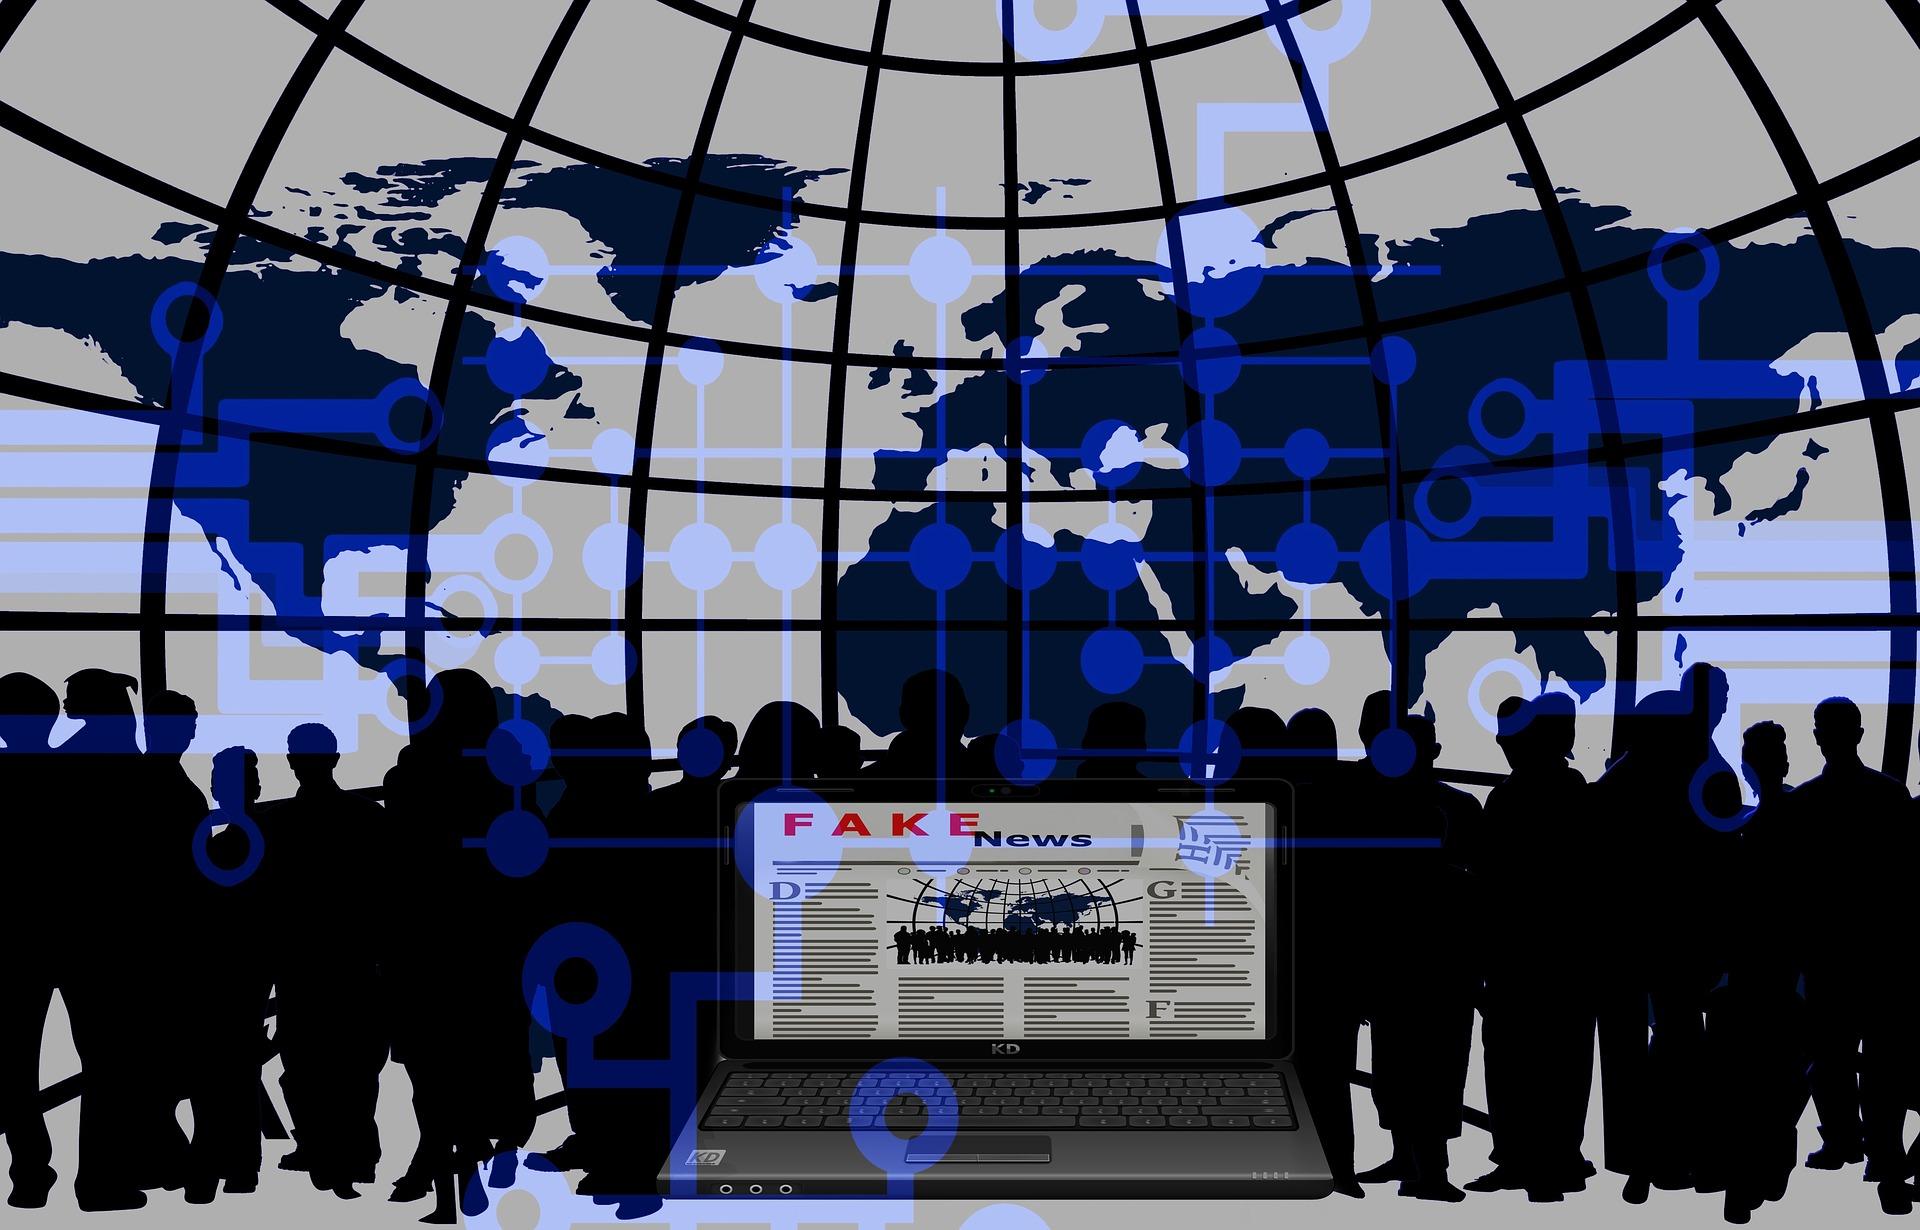 Poziv za online obuke o dezinformacijama